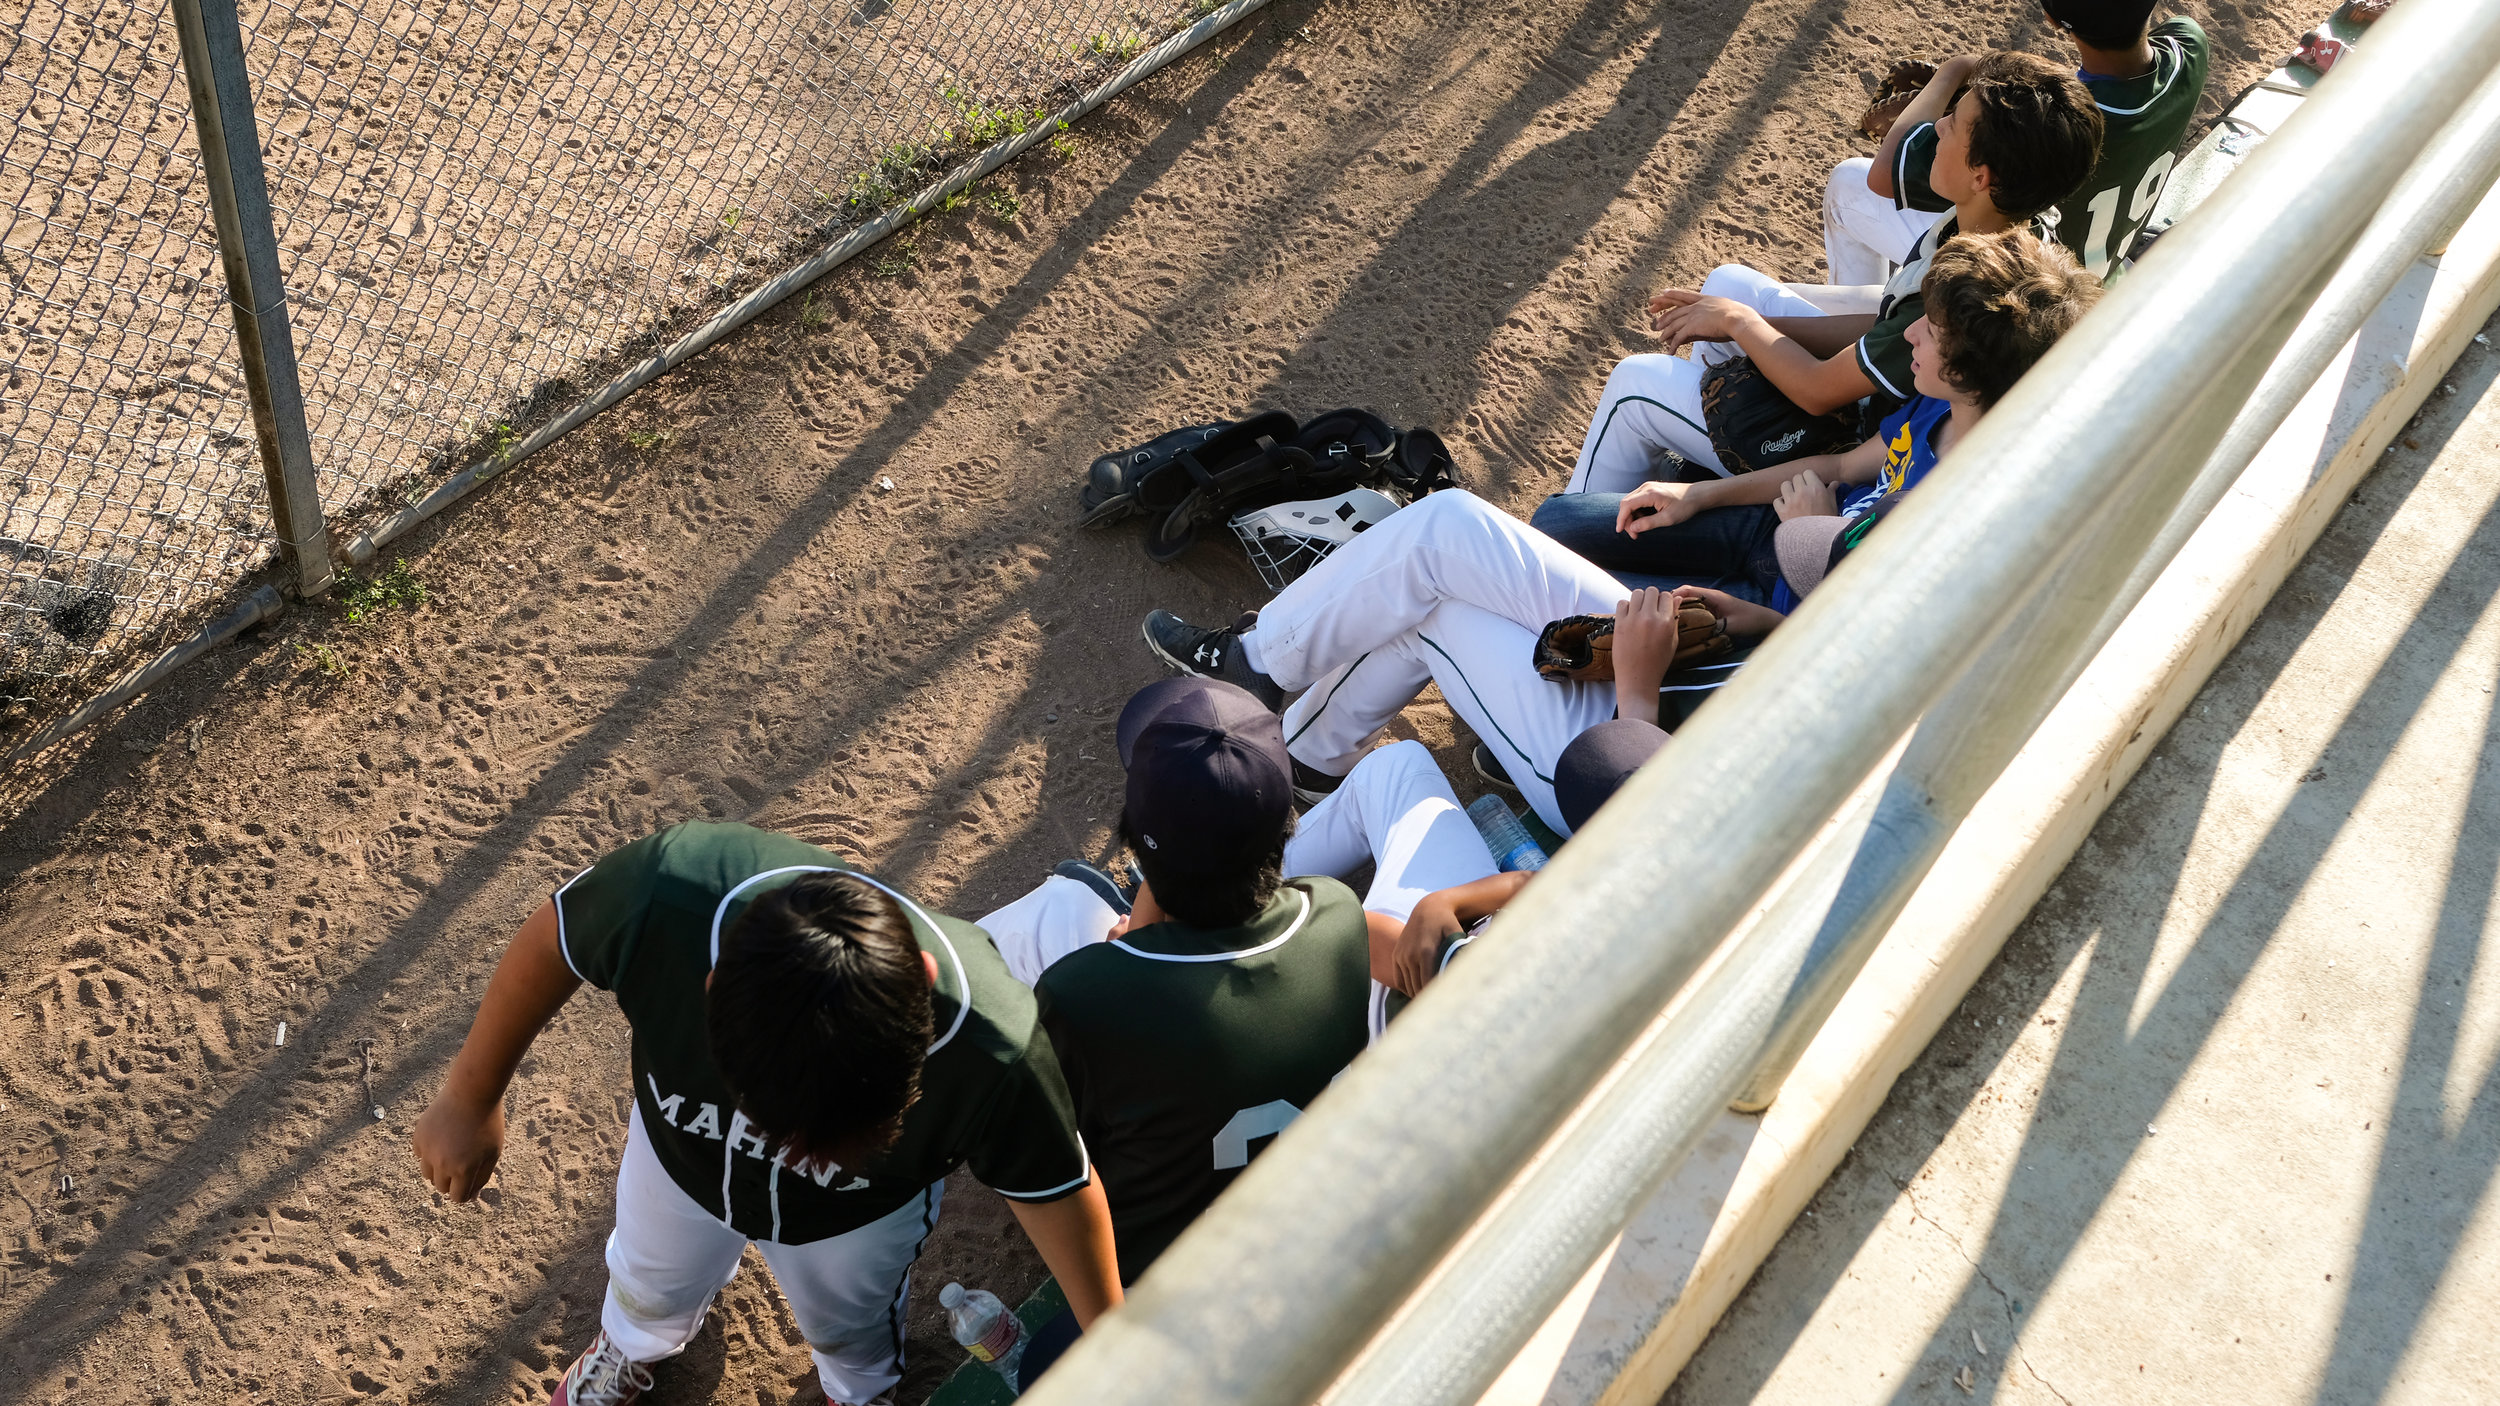 14_SAN-FRANCISCO_Baseball.jpg